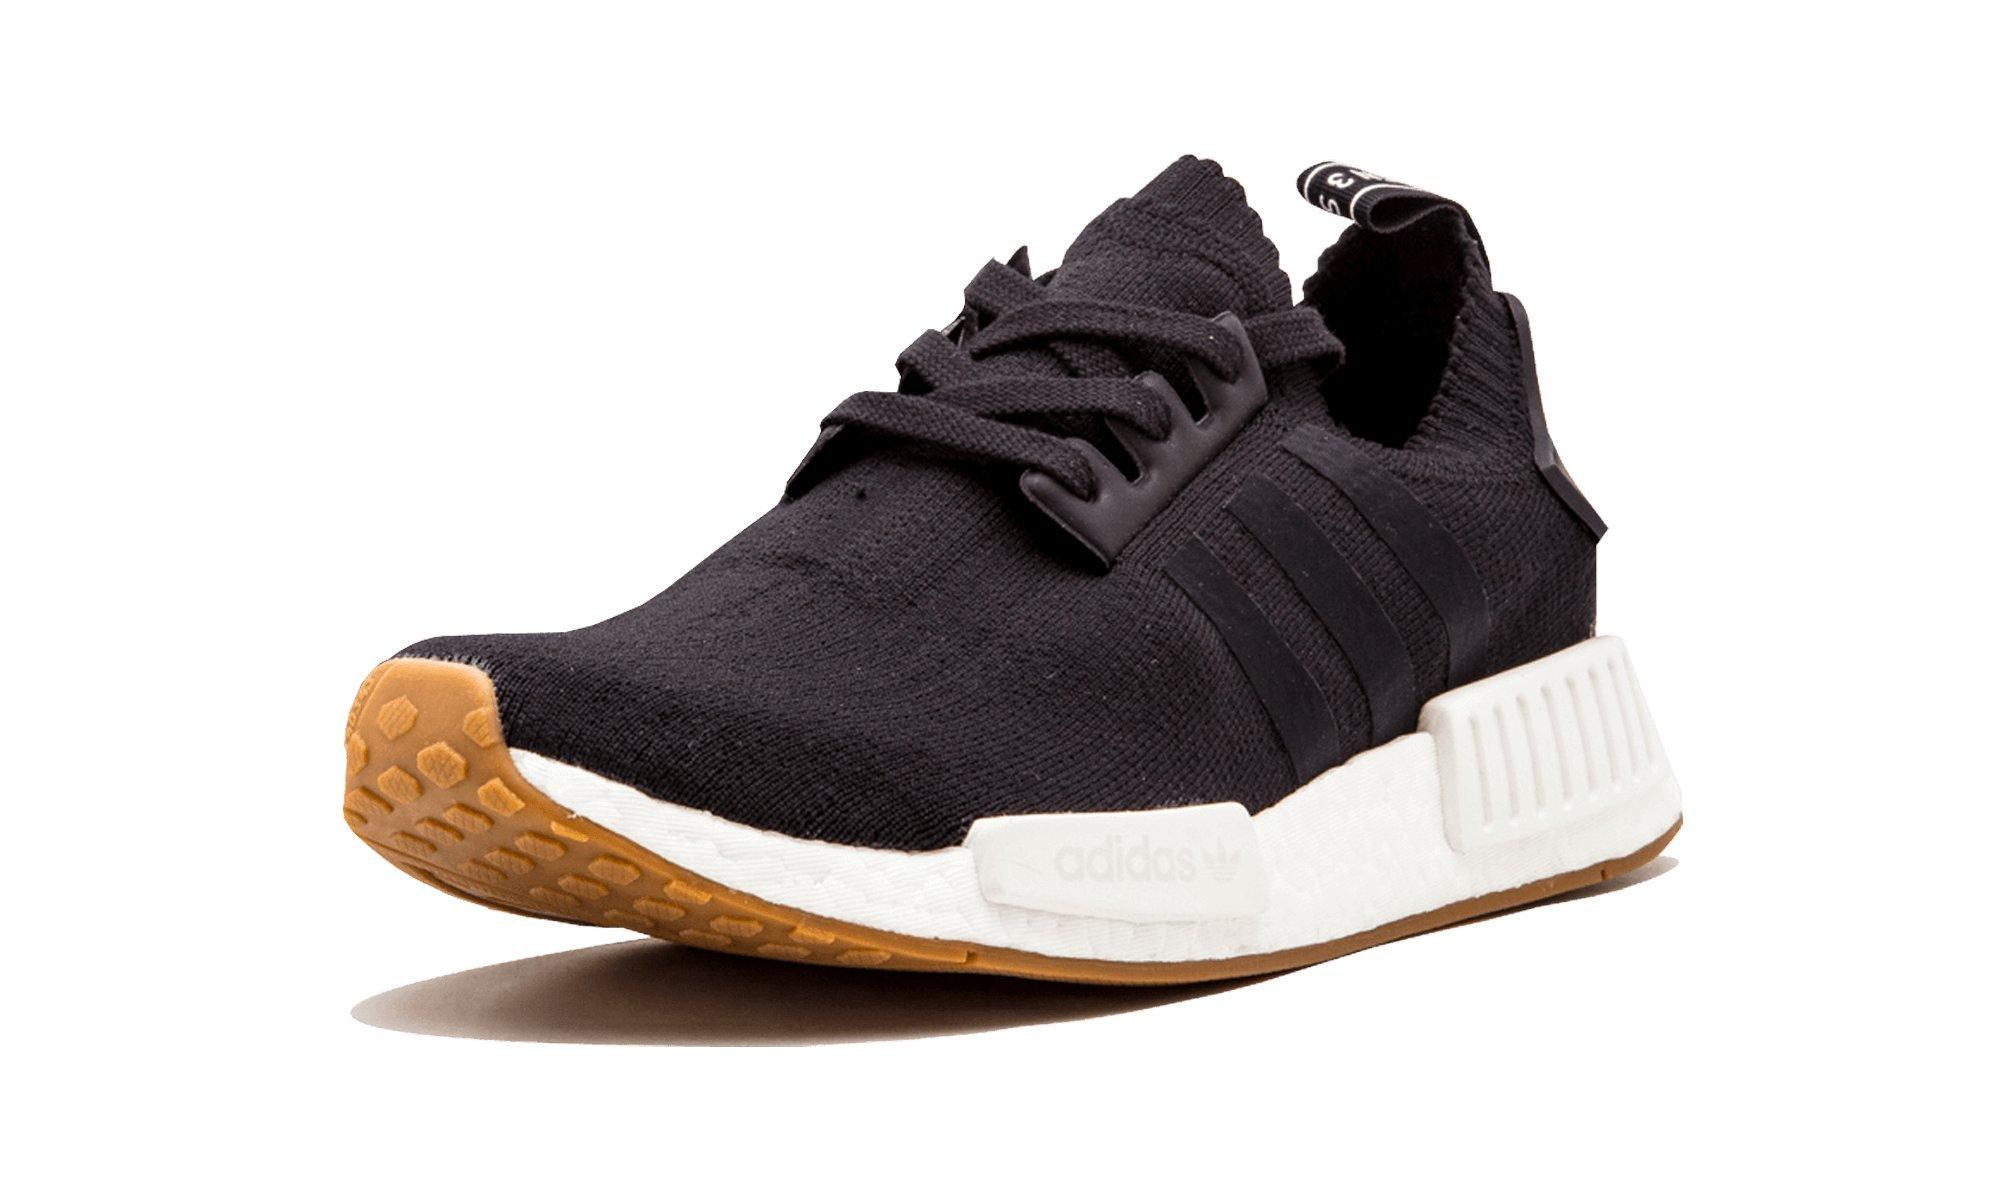 8d9c29b61a272 Adidas NMD R1 Triple White Boost 2017 Mens Size 13 BA7245.  185.00. Adidas  NMD R1 PK